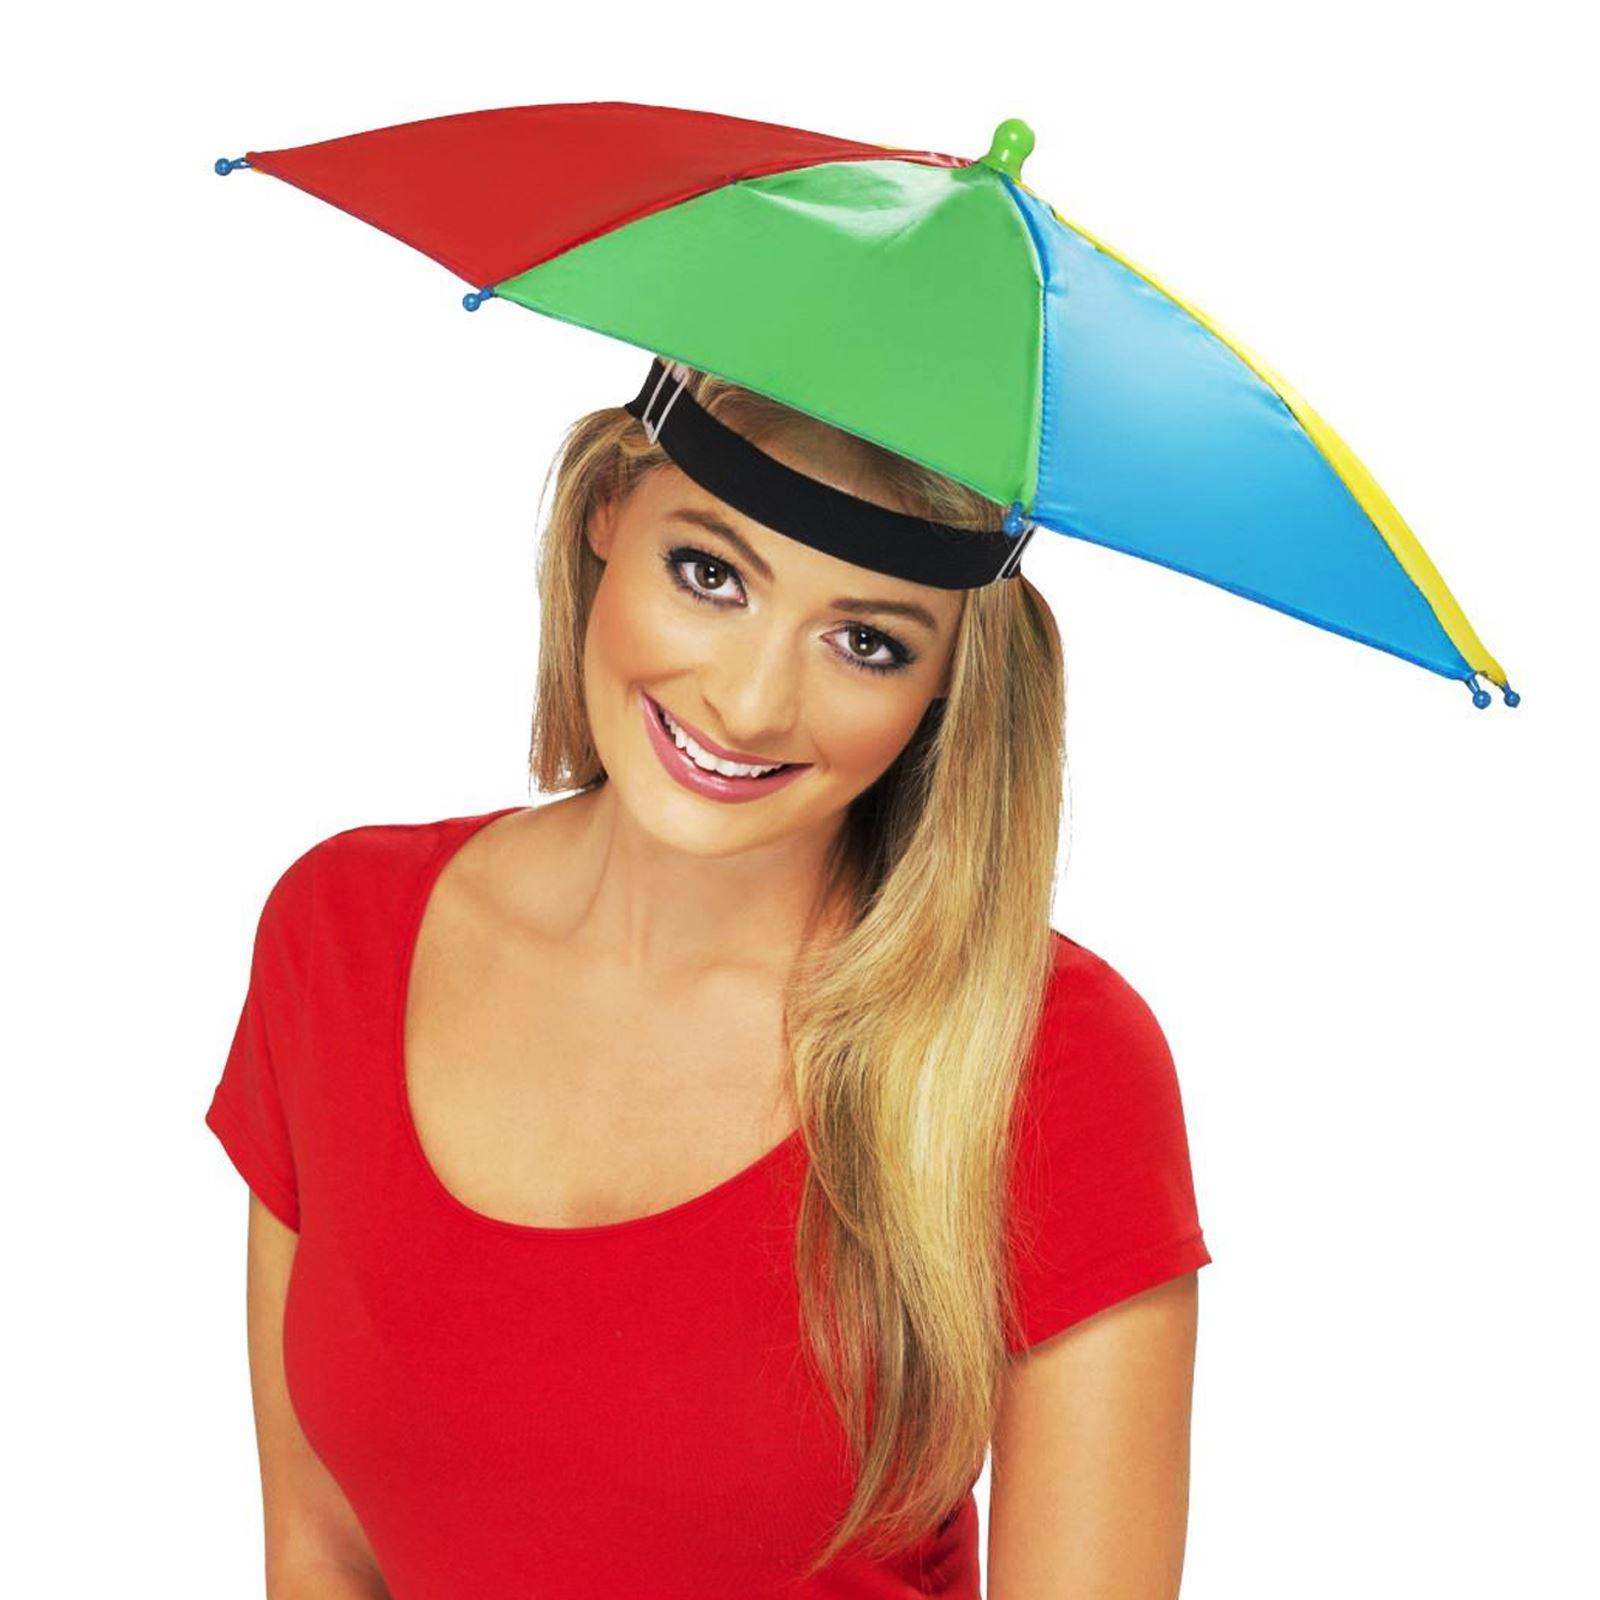 e2f91ffbd99b1 Adults Novelty Umbrella Hat Waterproof Rainbow Fishing Brolly Fancy ...